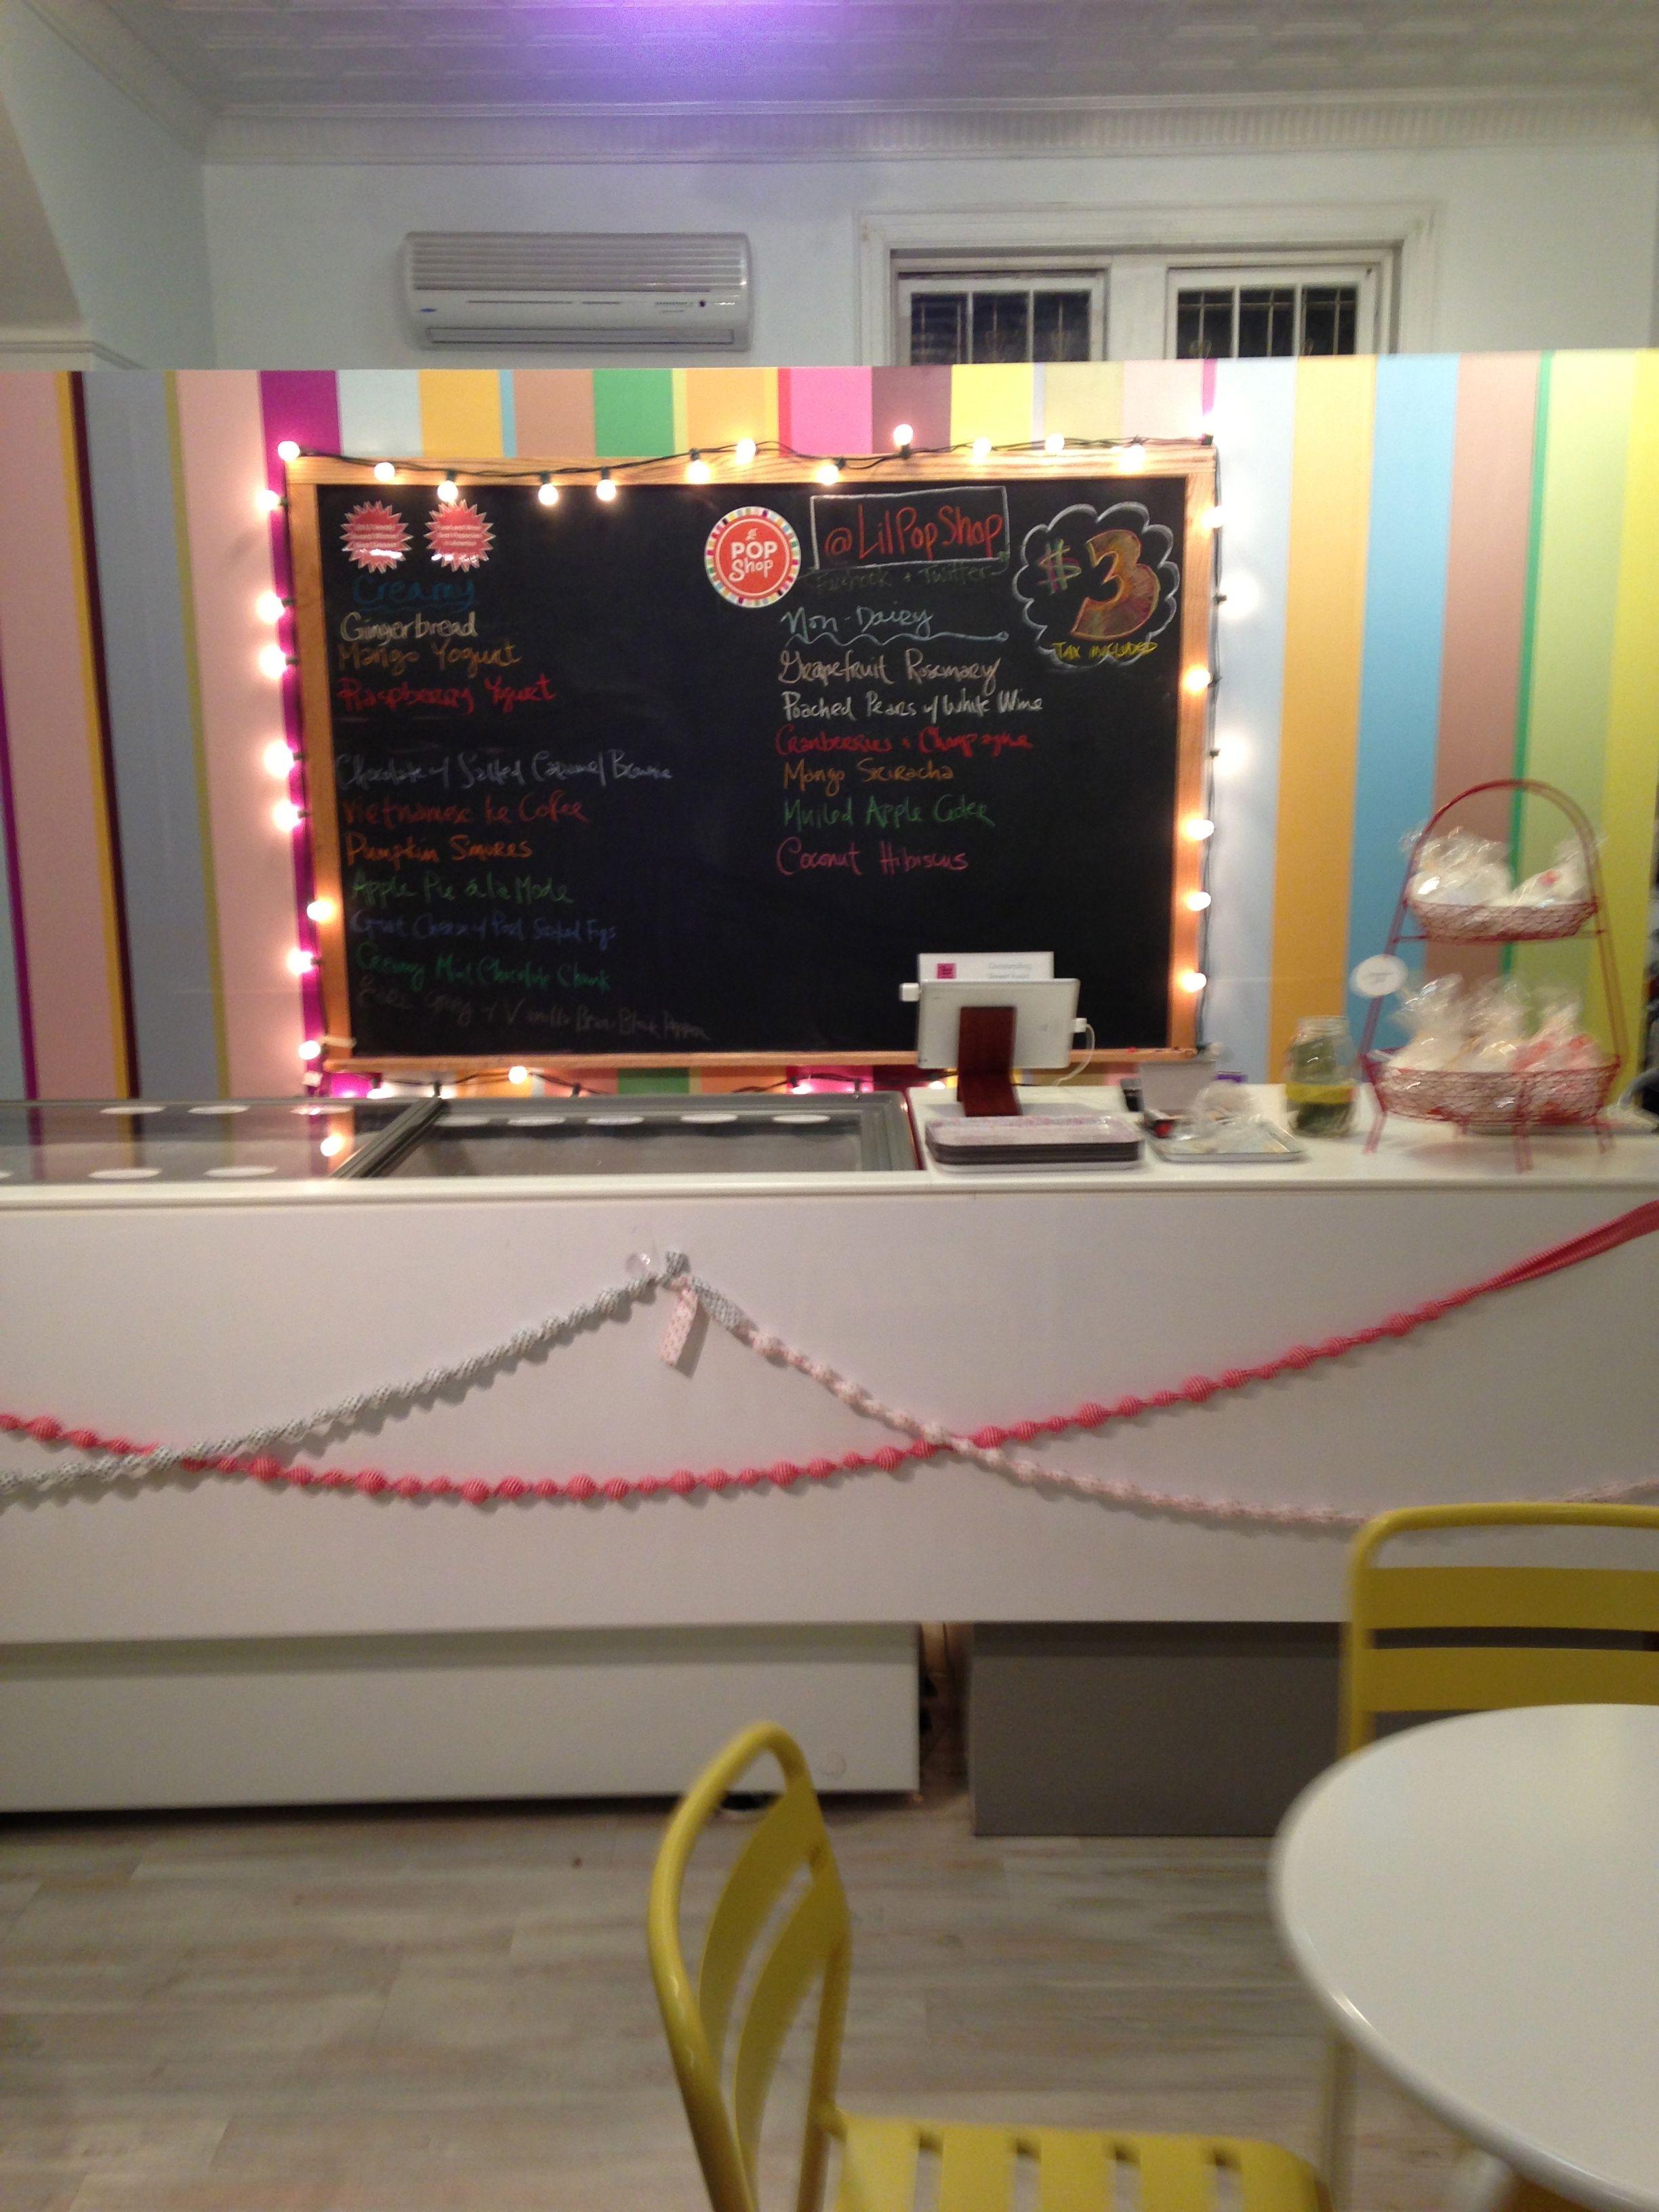 Pop Shop in Philly